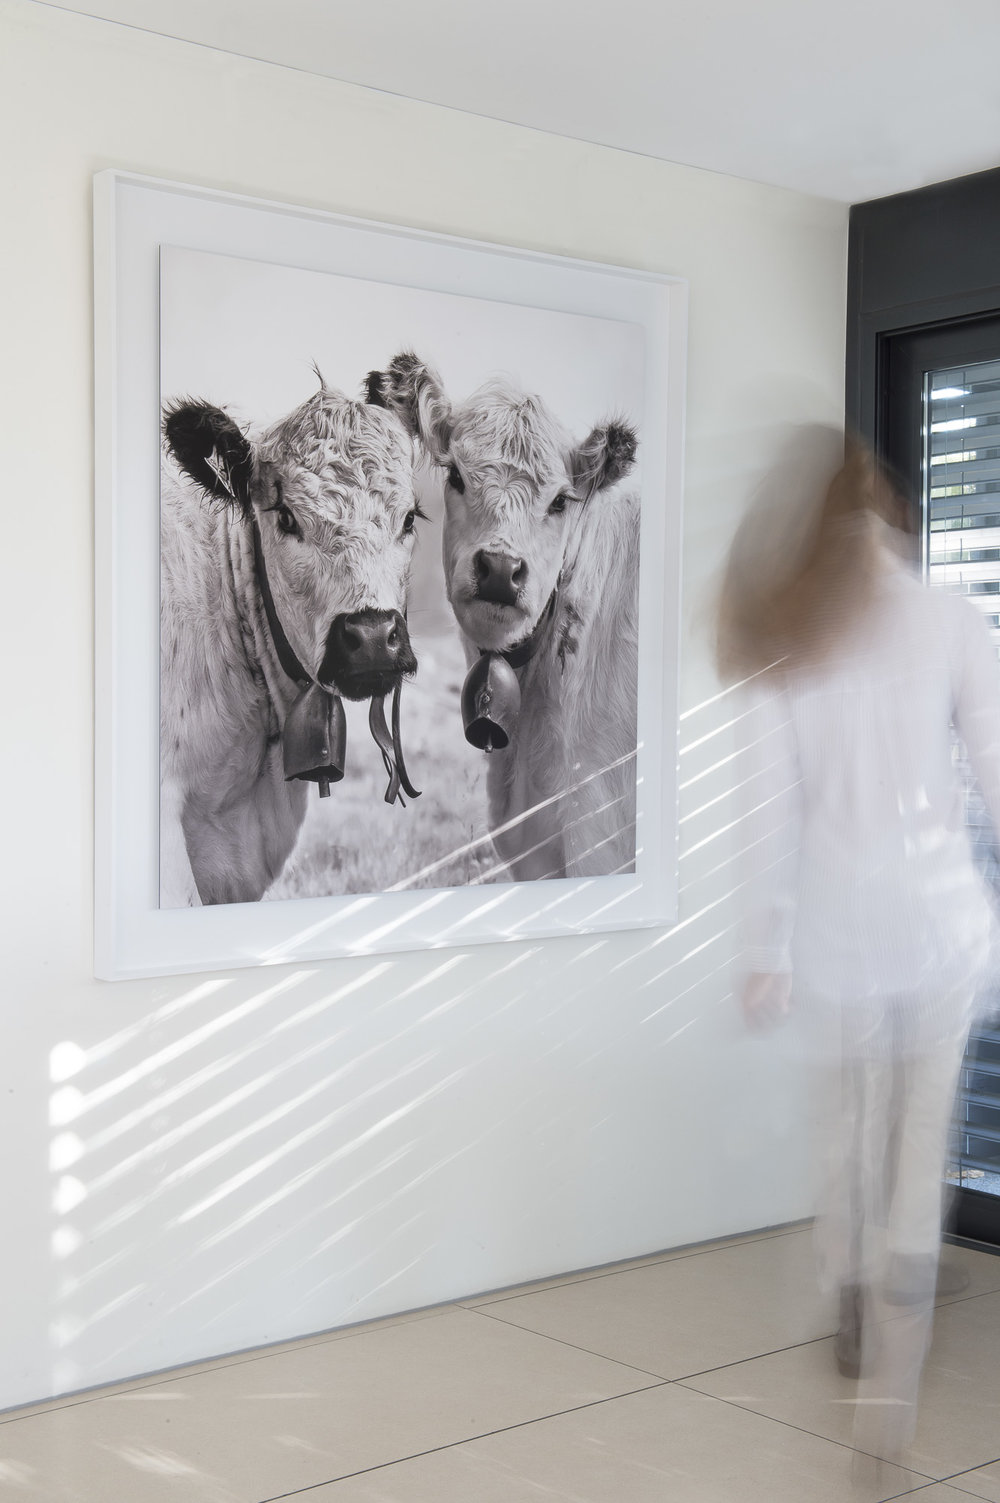 Tilia & Gayla 8/25, fine art print Hahnemühle 120cm x 120cm, NY Schattenfugenrahmen 140cm x 140cm